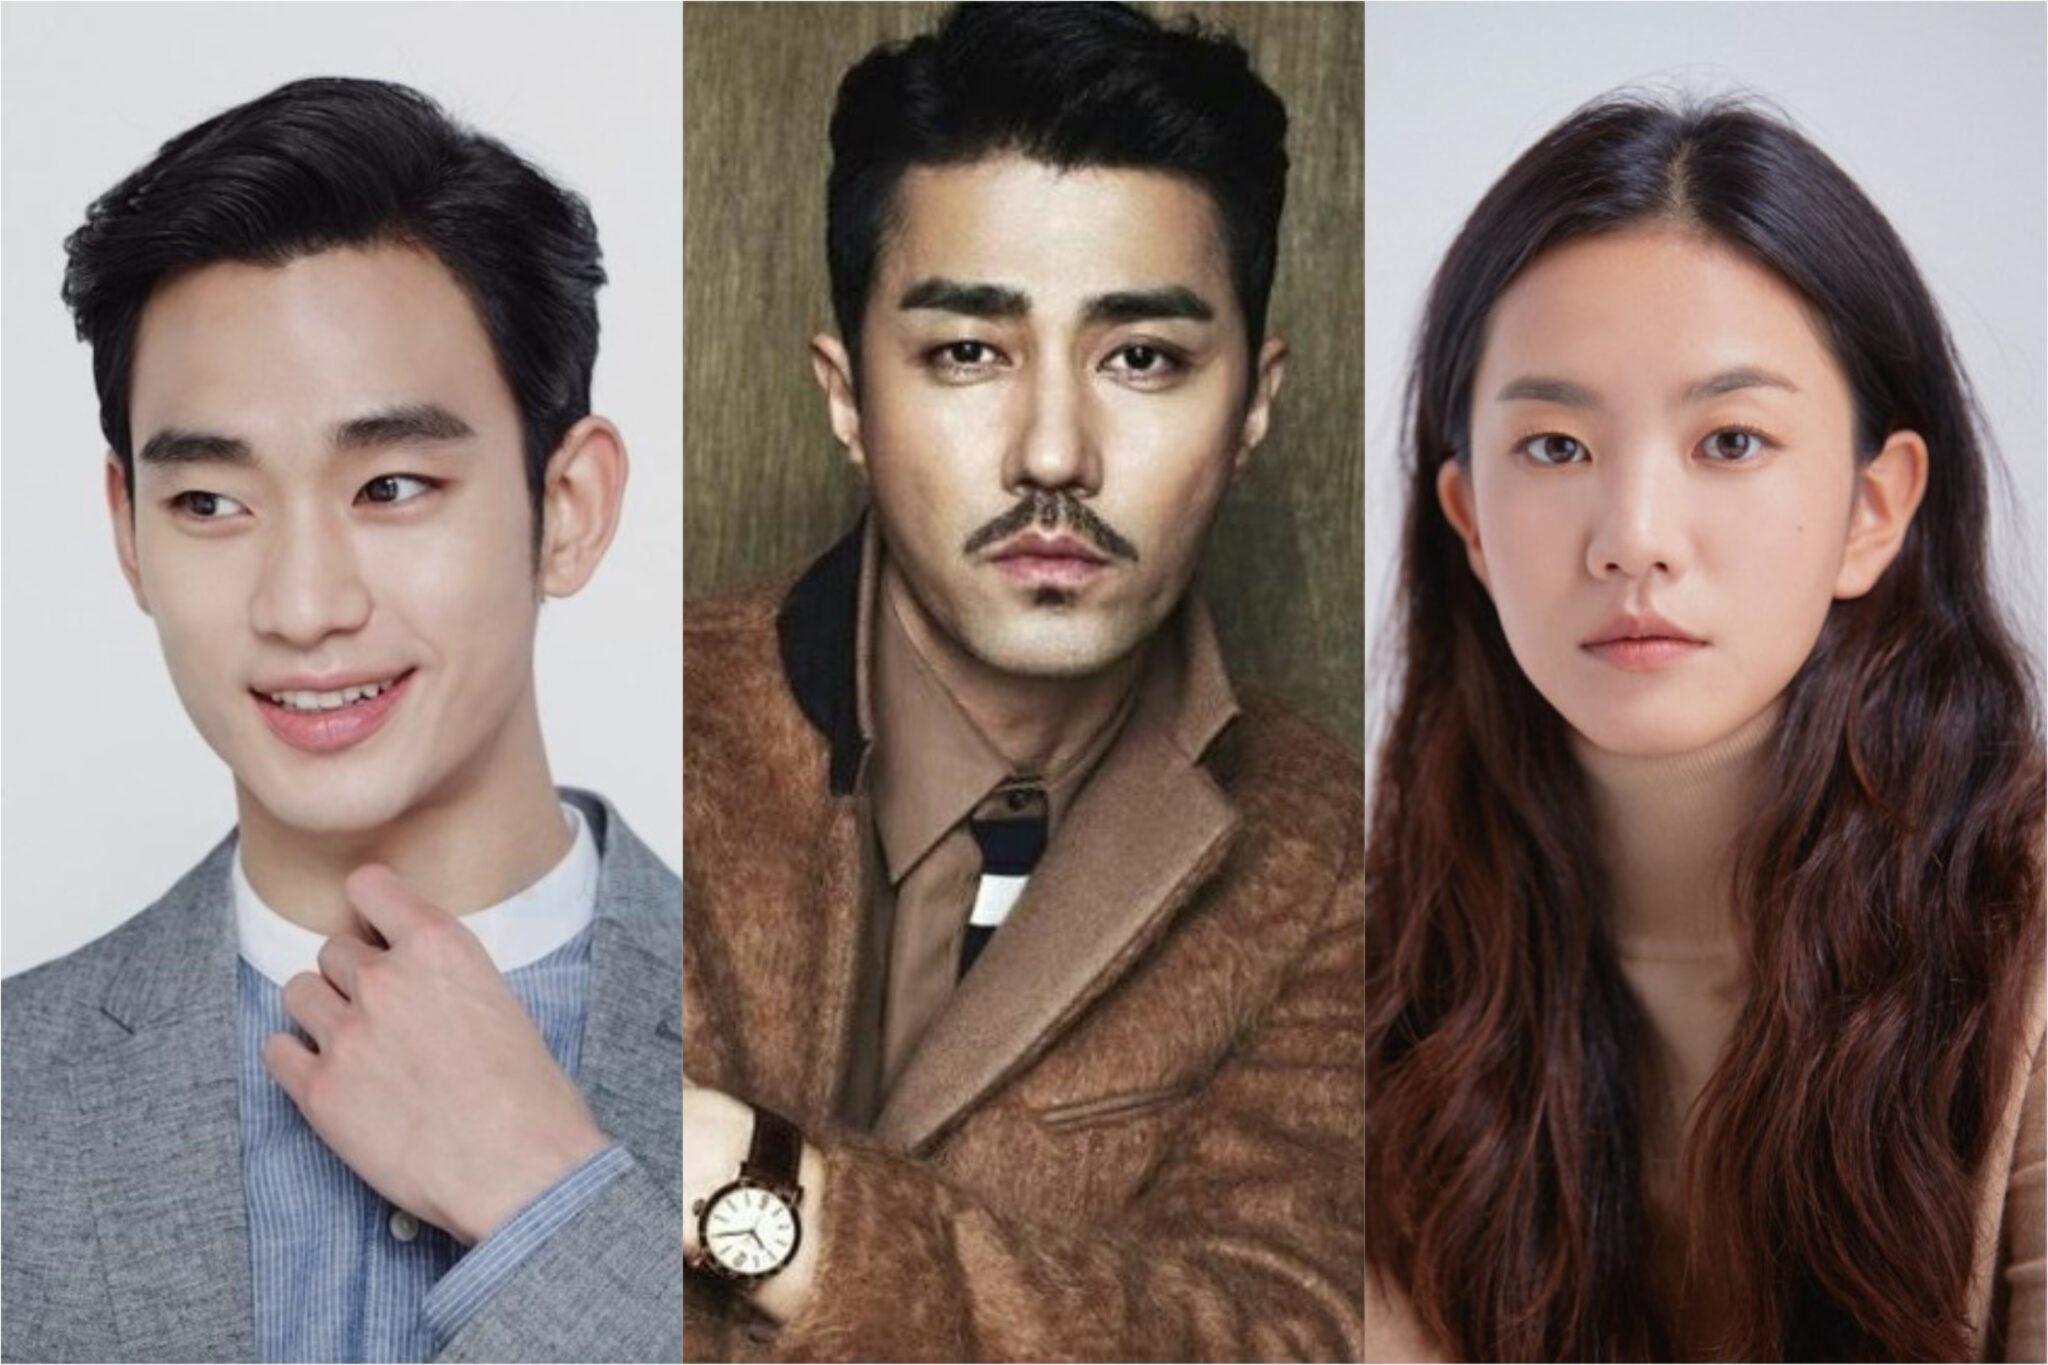 Lee Seol confirmed for new drama alongside Cha Seung-won and Kim Soo-hyun